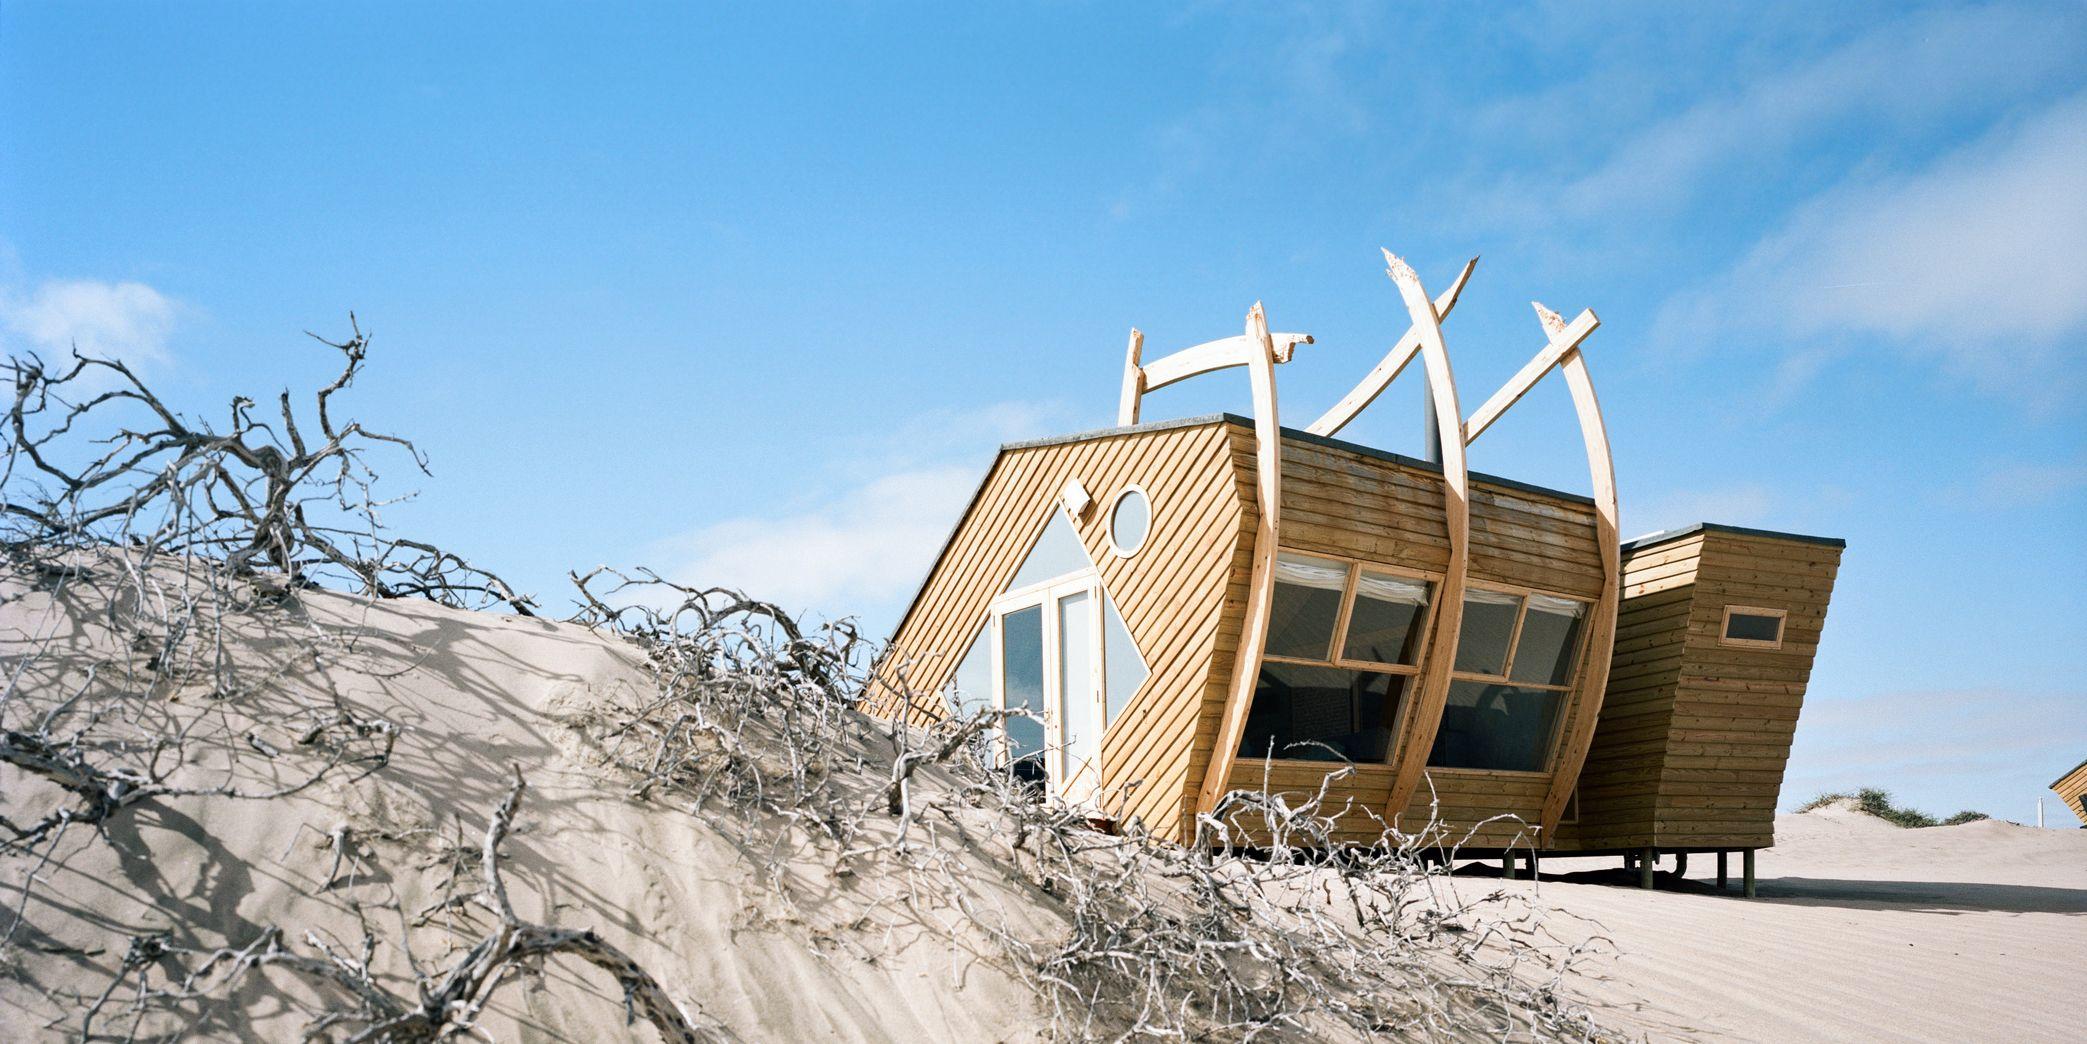 Shipwreck Lodge, parco nazionale di Skeleton Coast, Namibia, Nina Maritz Architects